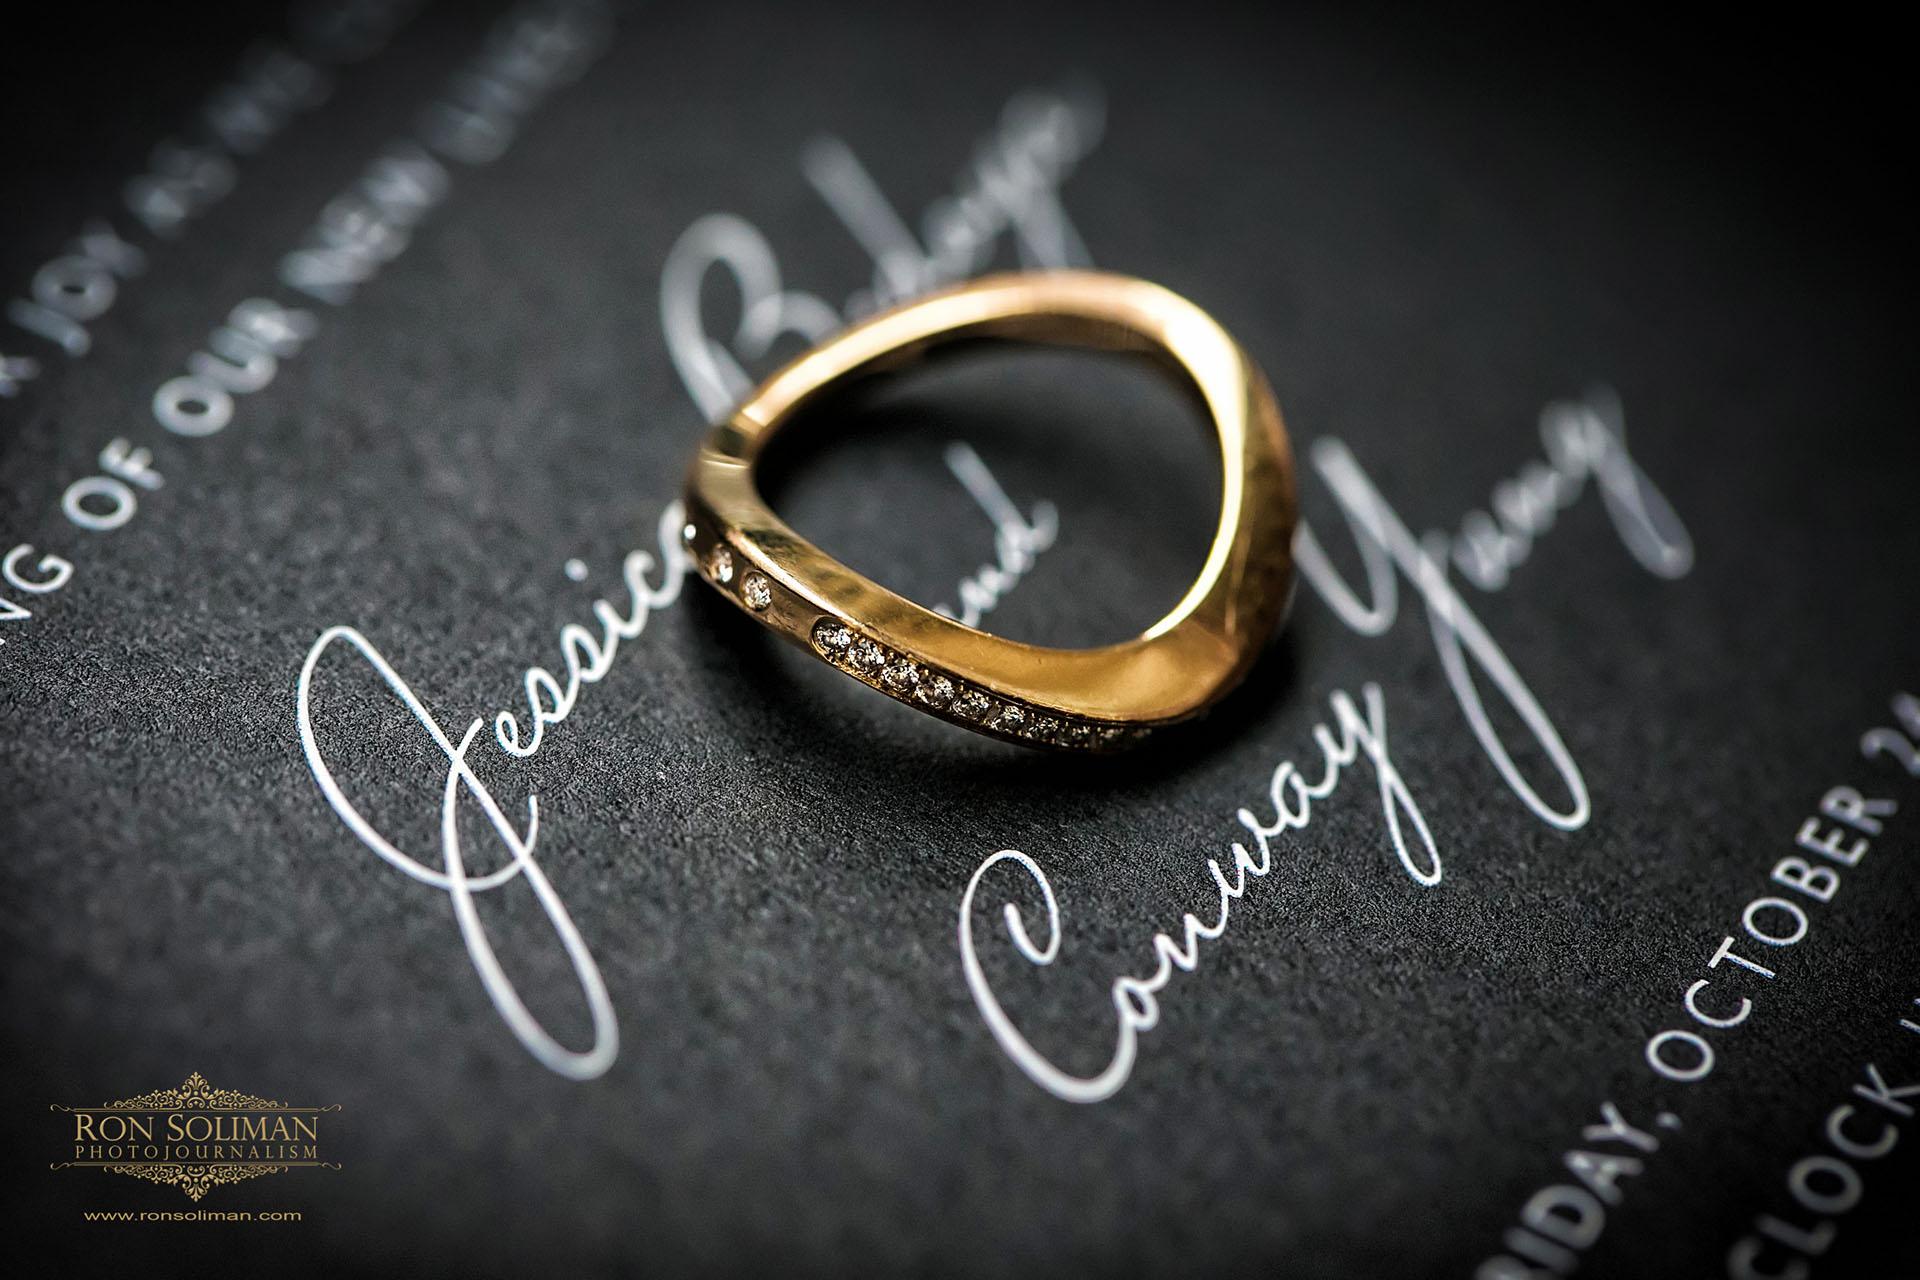 LIGHTHOUSE CHELSEA PIERS WEDDING 02